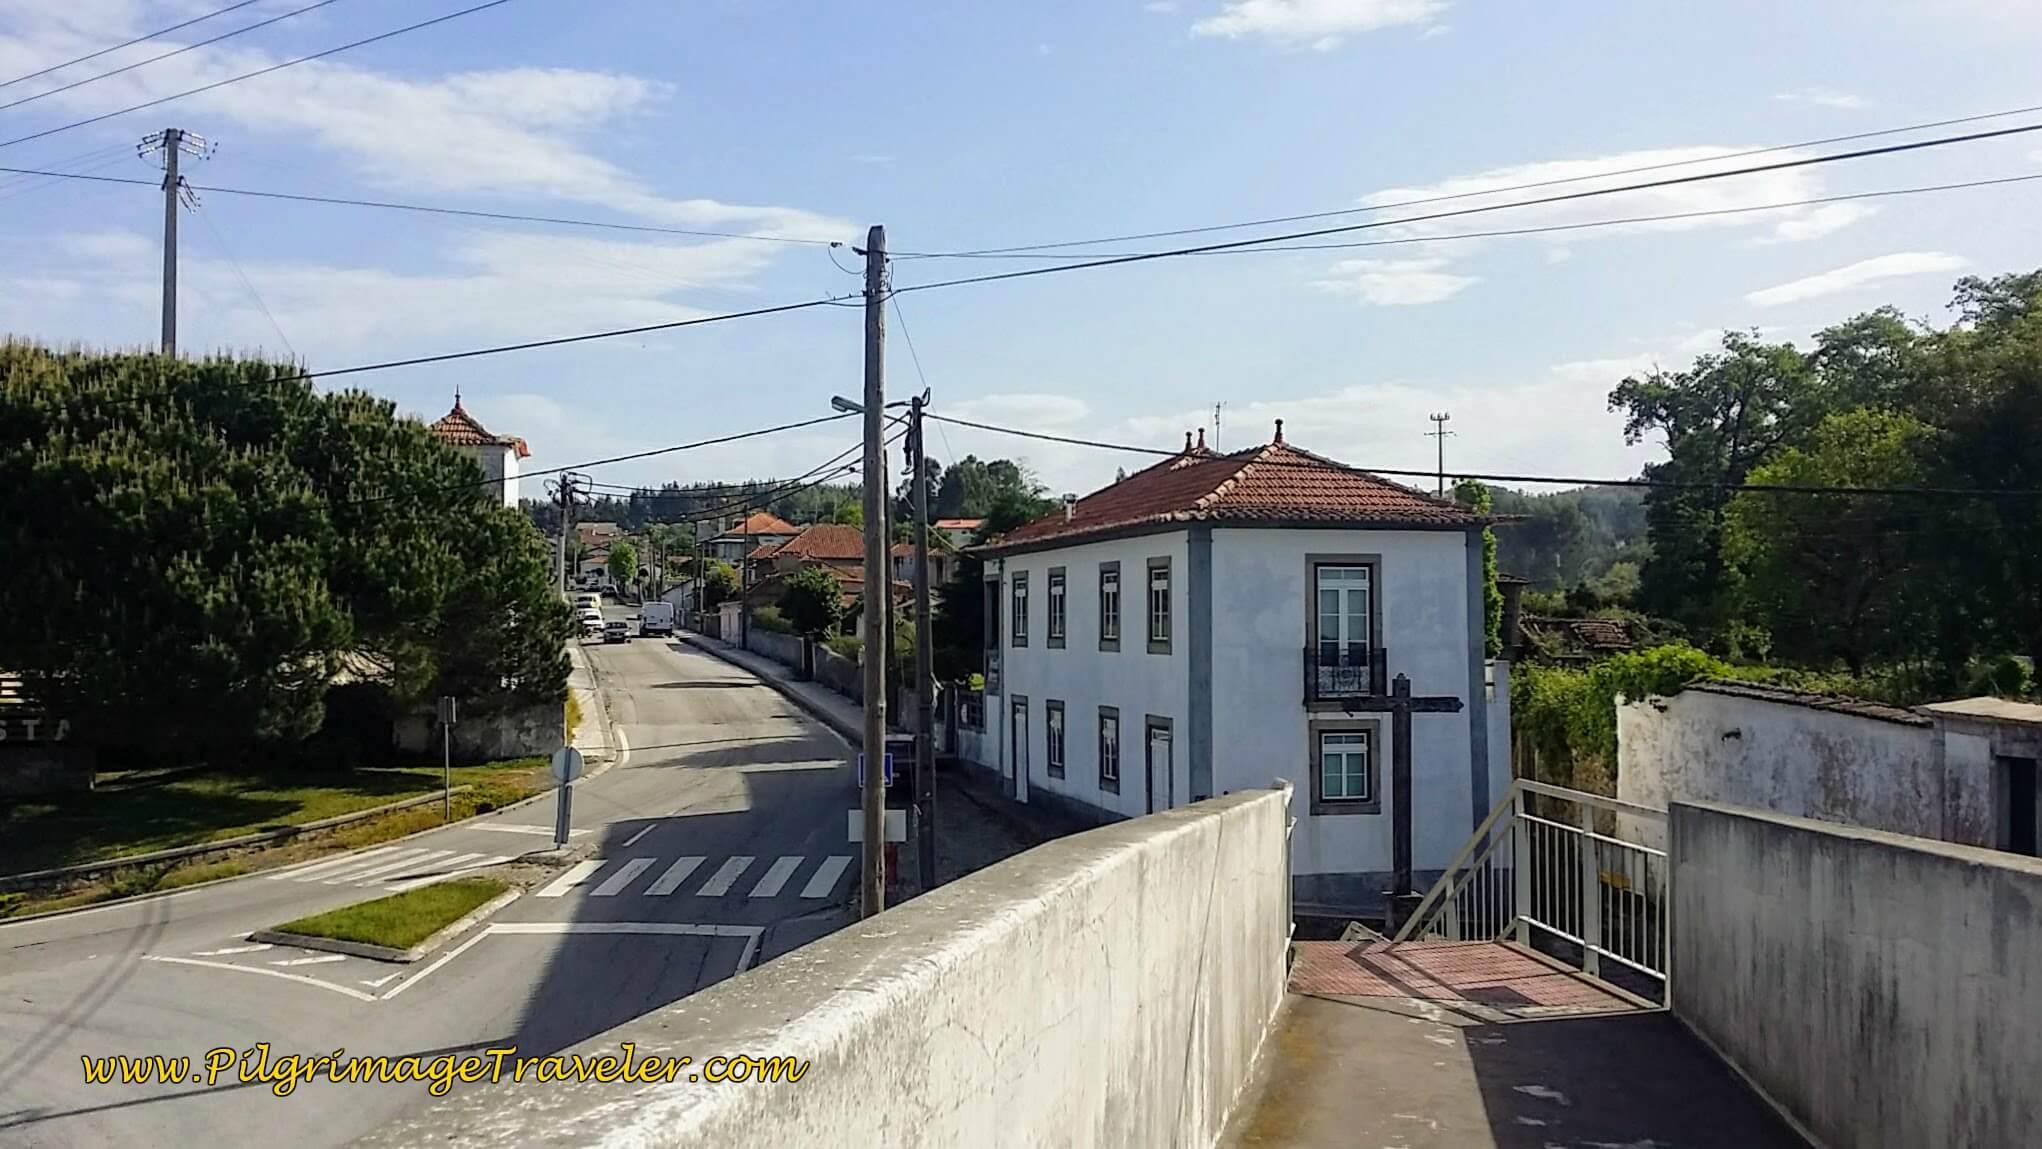 Towards the Rua do Pinheiro on the Portuguese Way